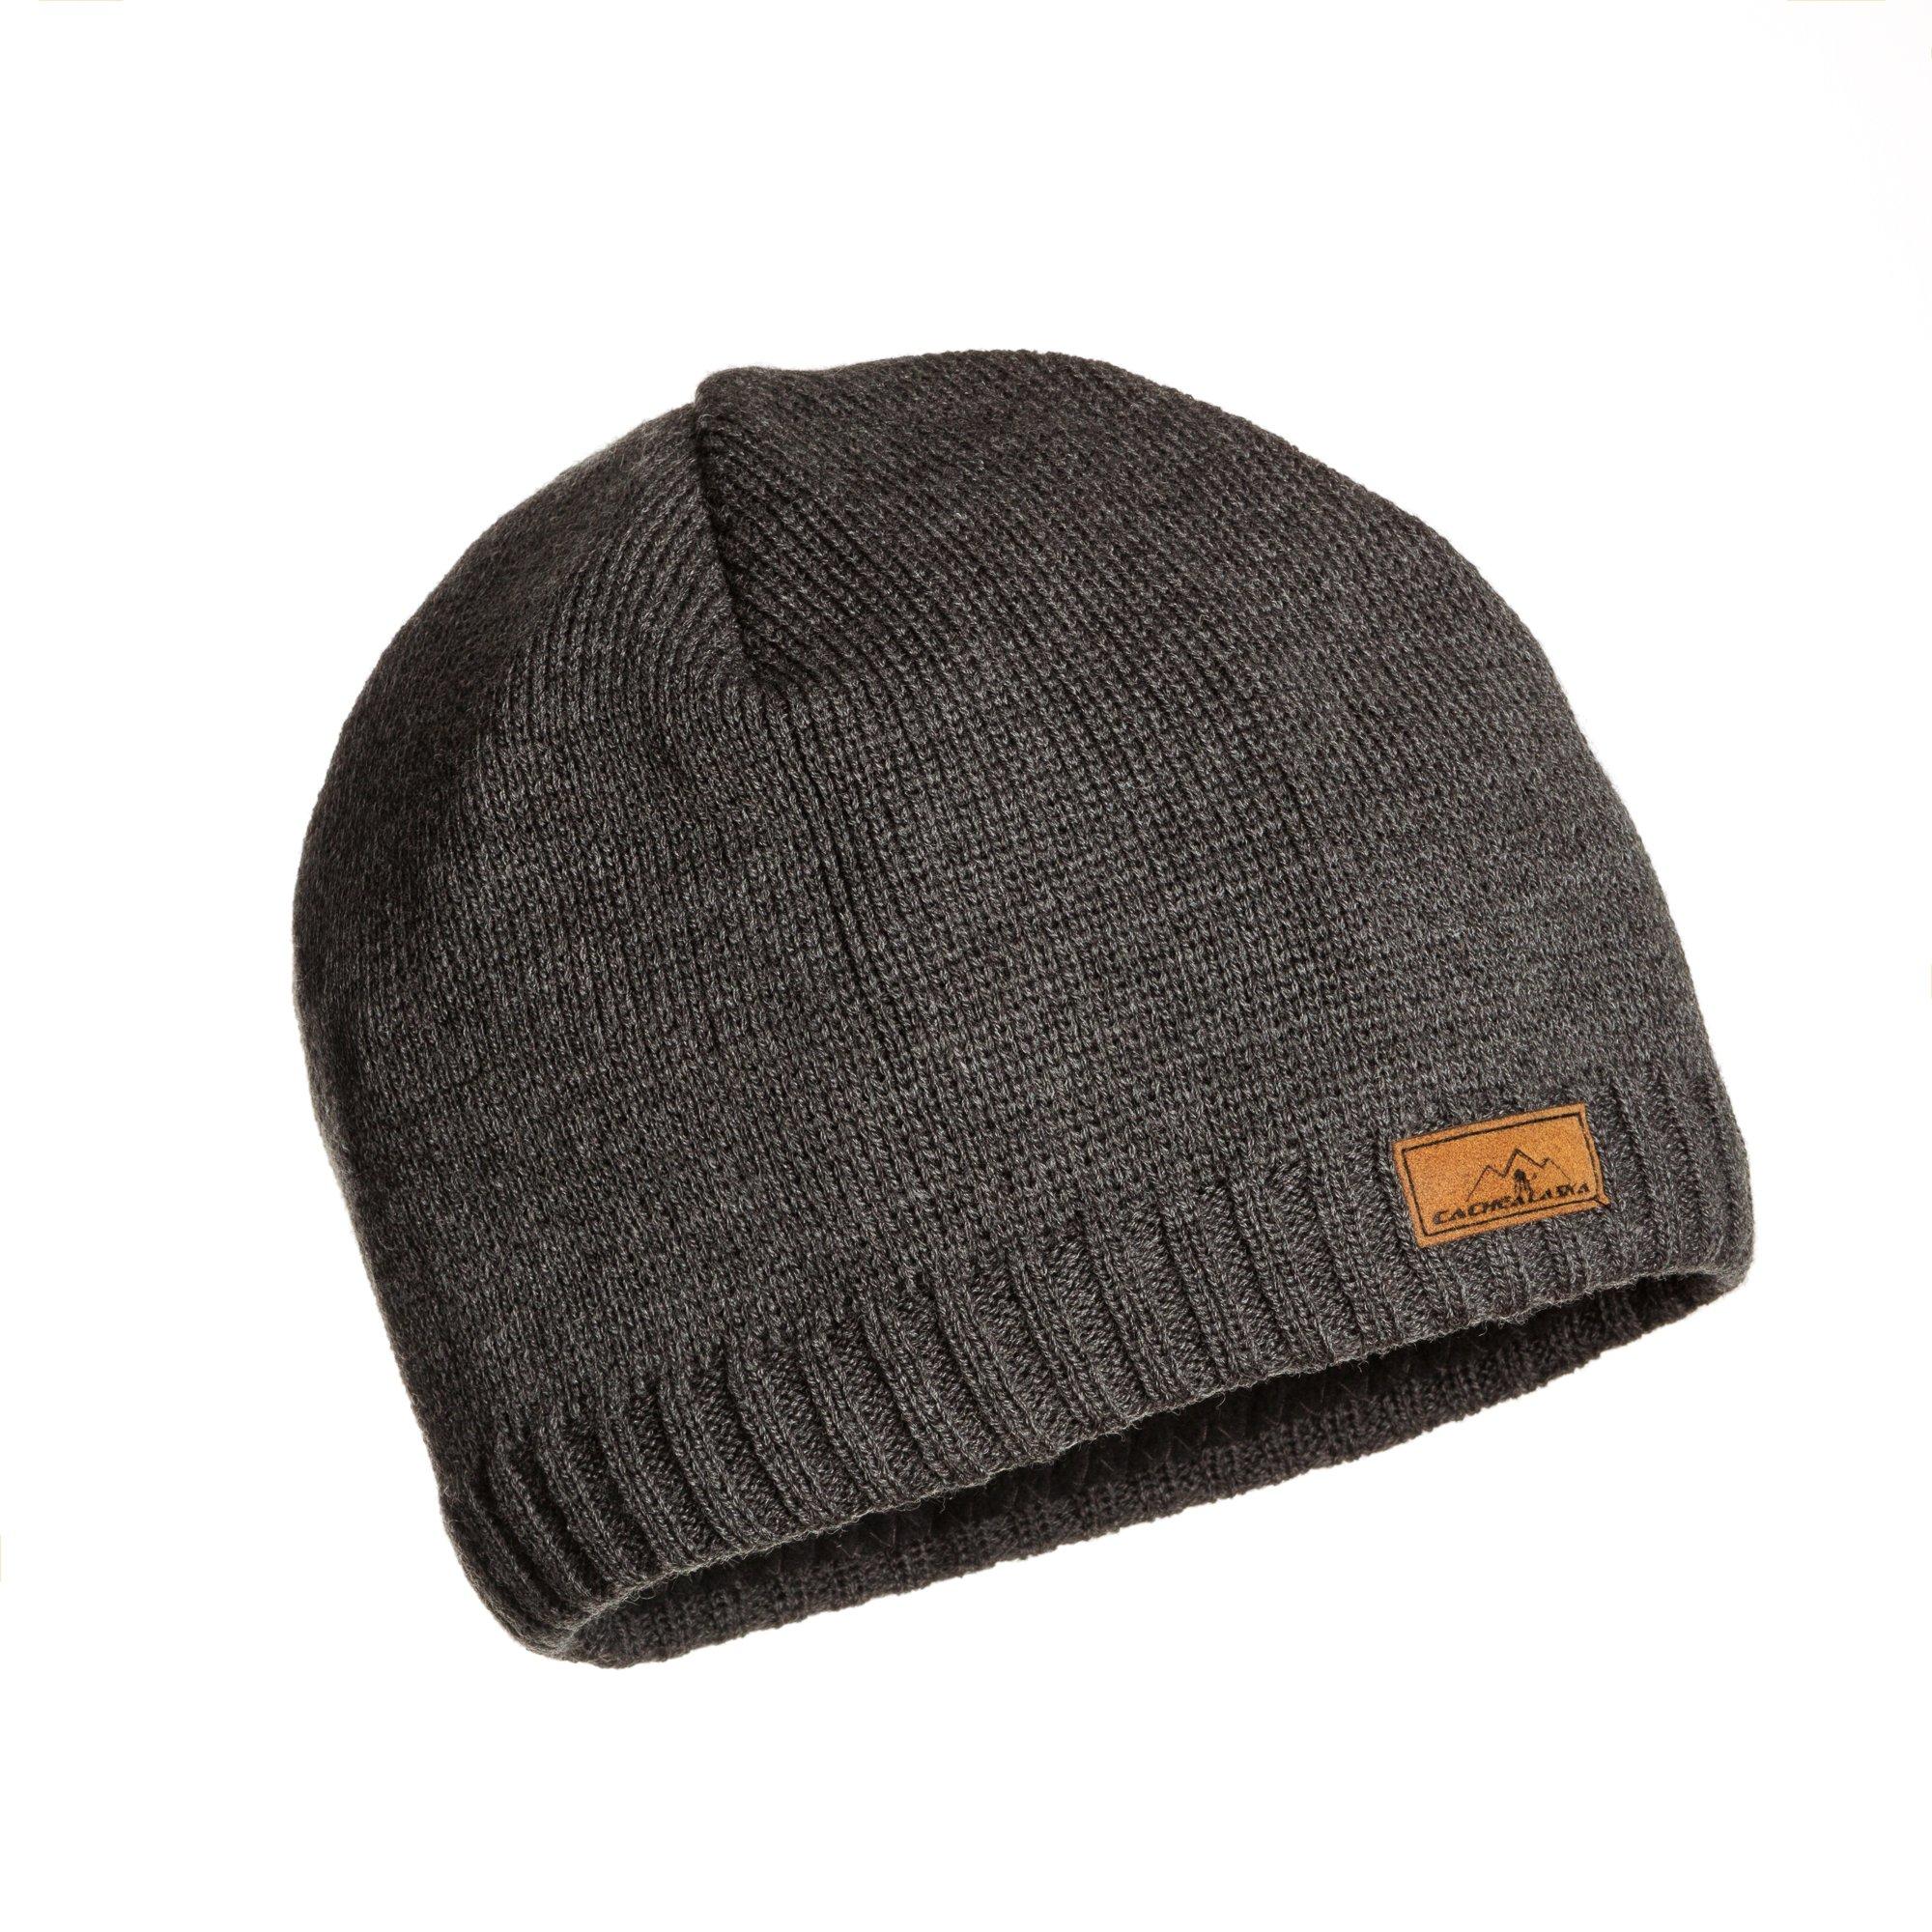 Beanie Wool Knit Skull Cap - Wool Blend Ski Hat Best Alaska Gift - Men or Women